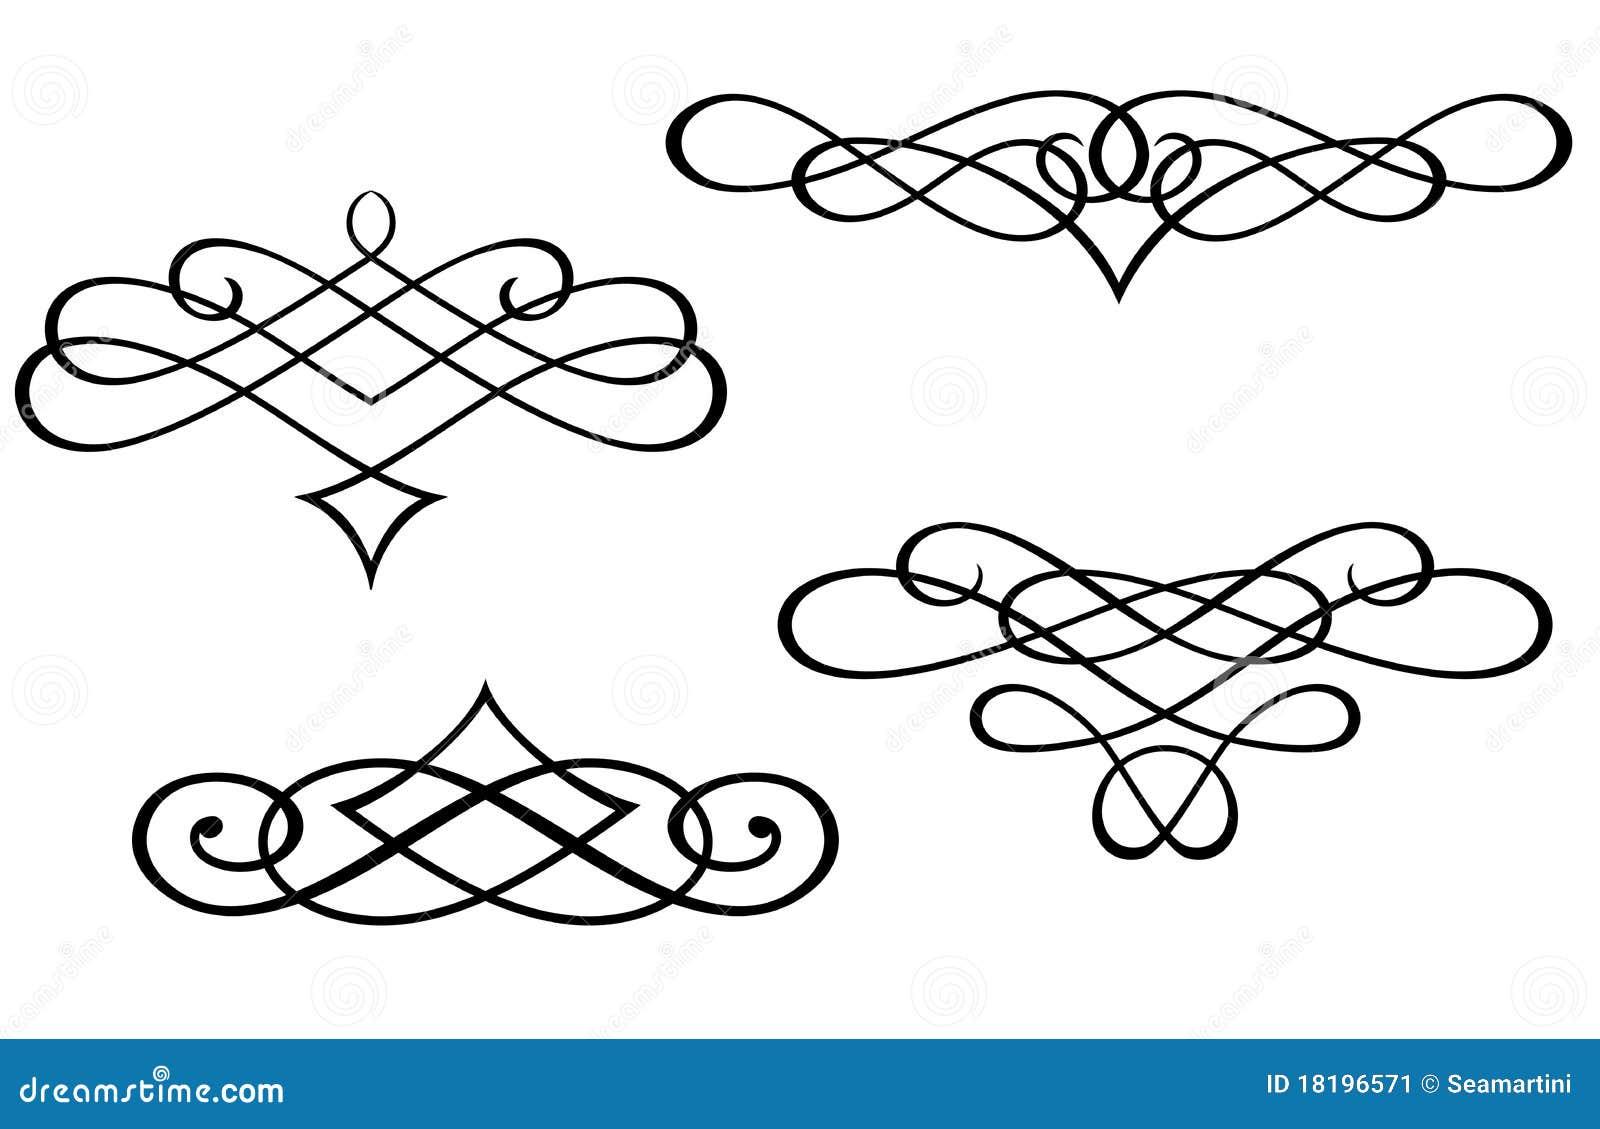 Monograms and swirl elements